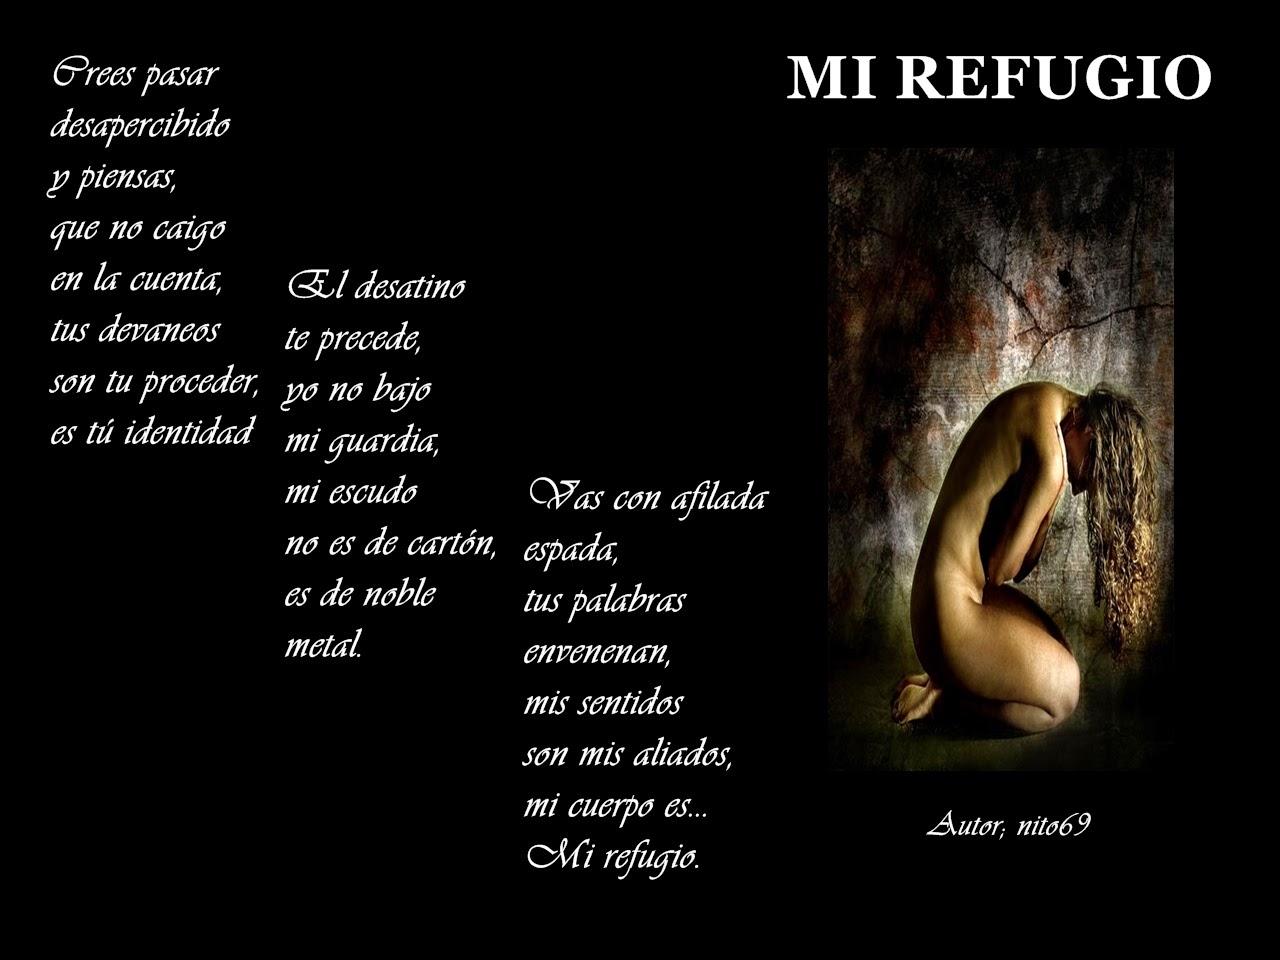 MI REFUGIO